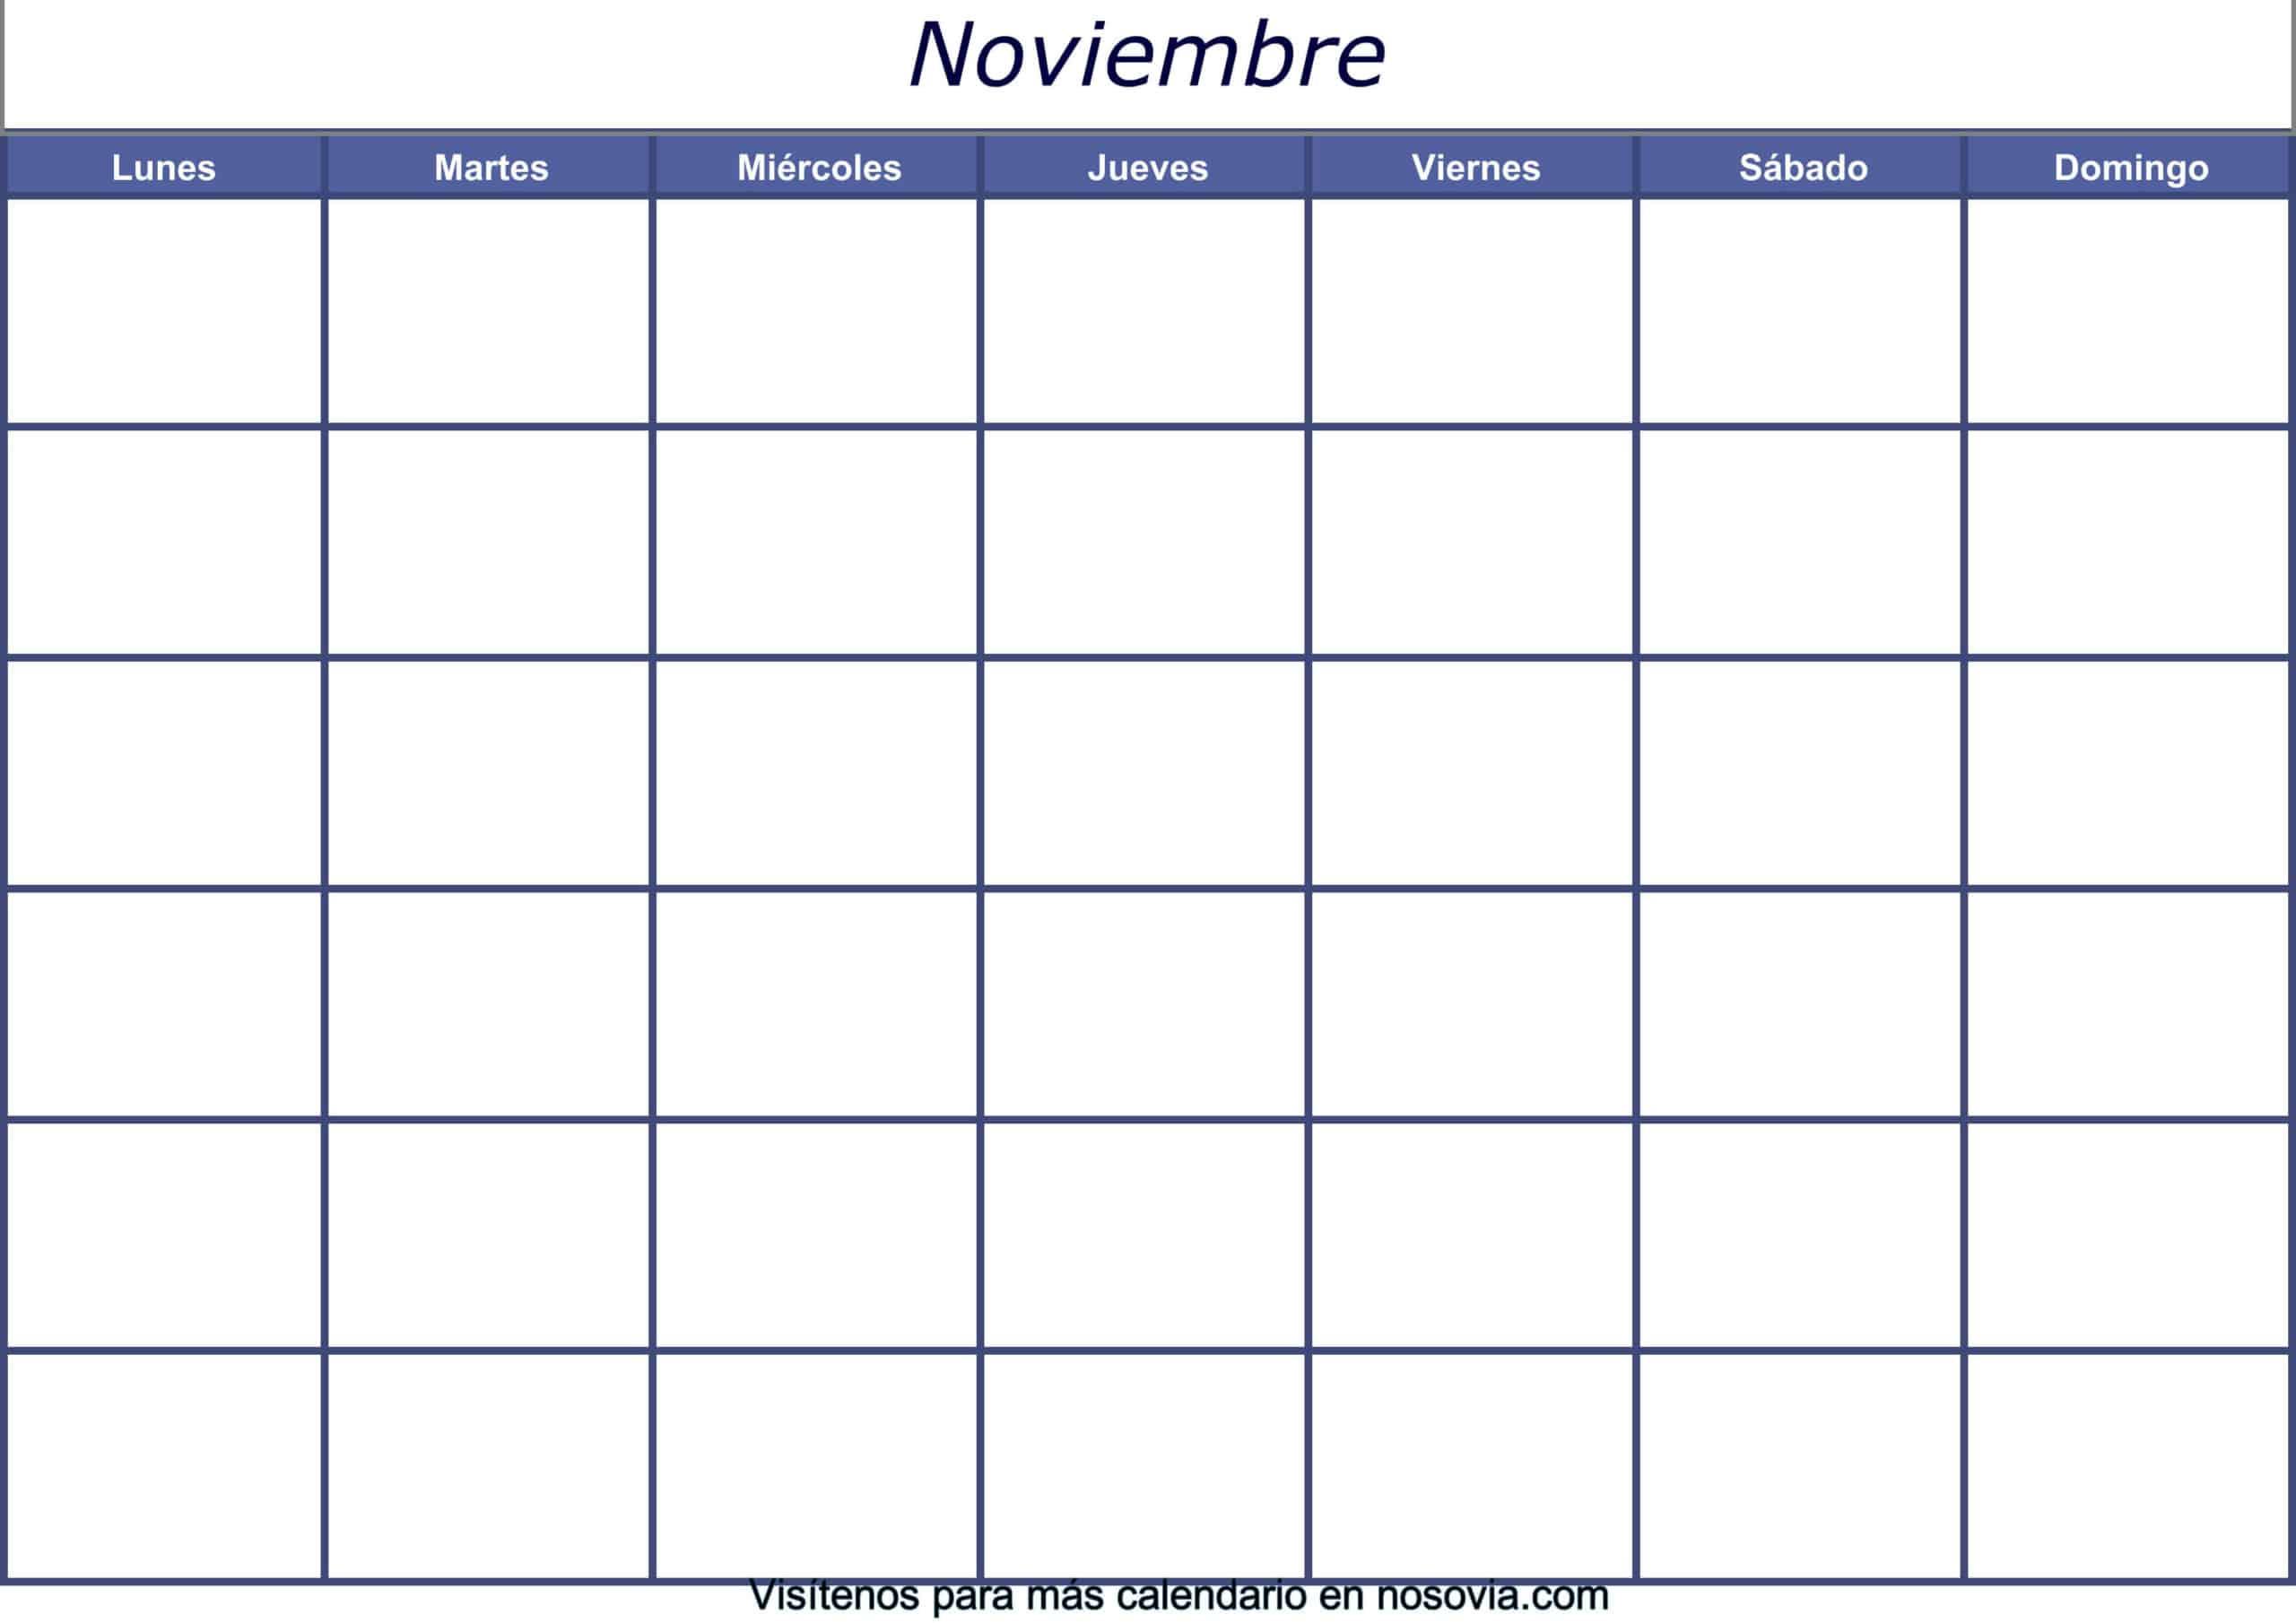 Calendario-noviembre-2020-en-blanco-para-imprimir-gratis